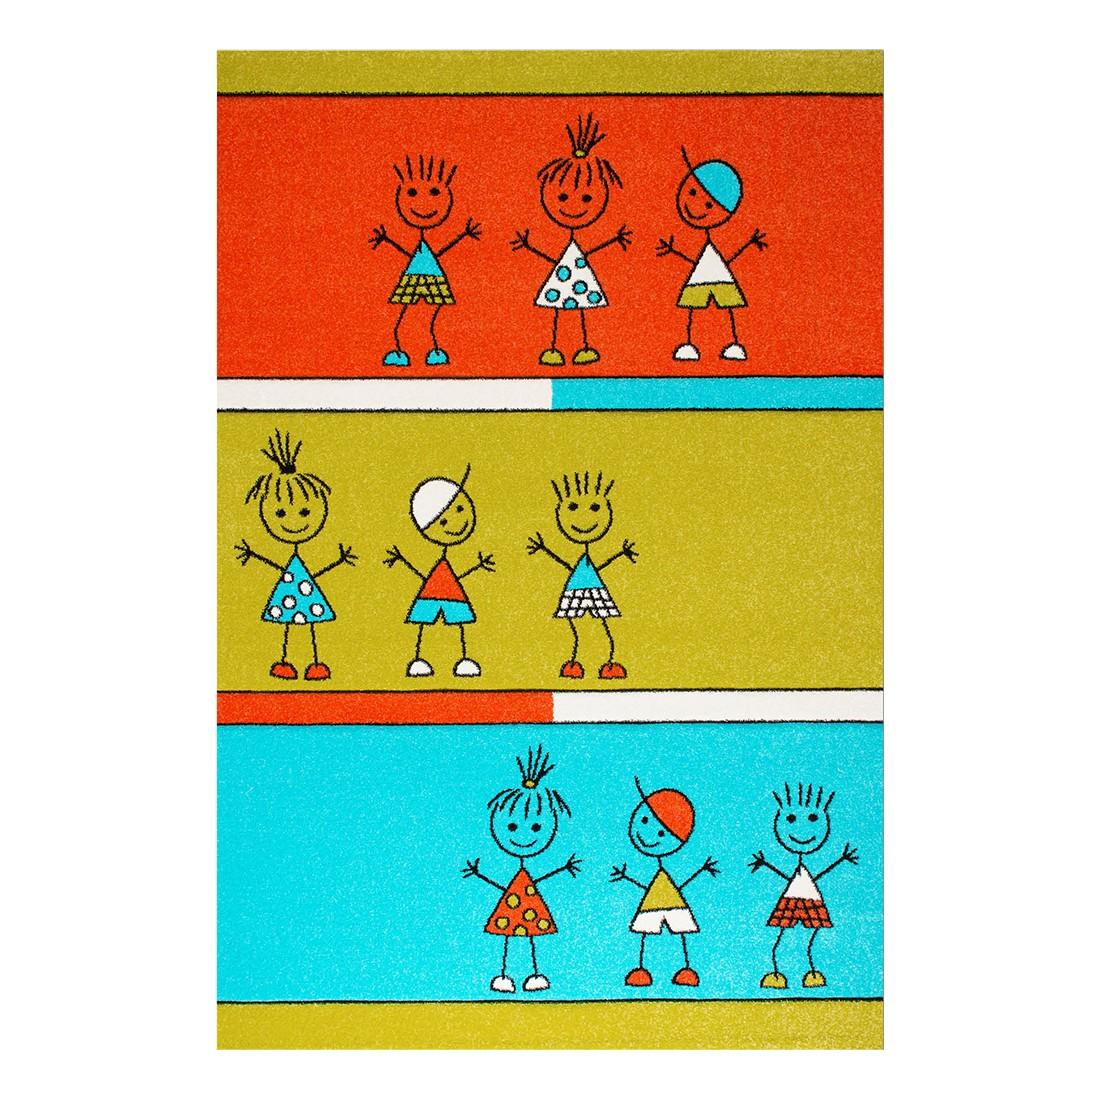 Kinderteppich Friends I – 120 x 170 cm, Obsession jetzt bestellen